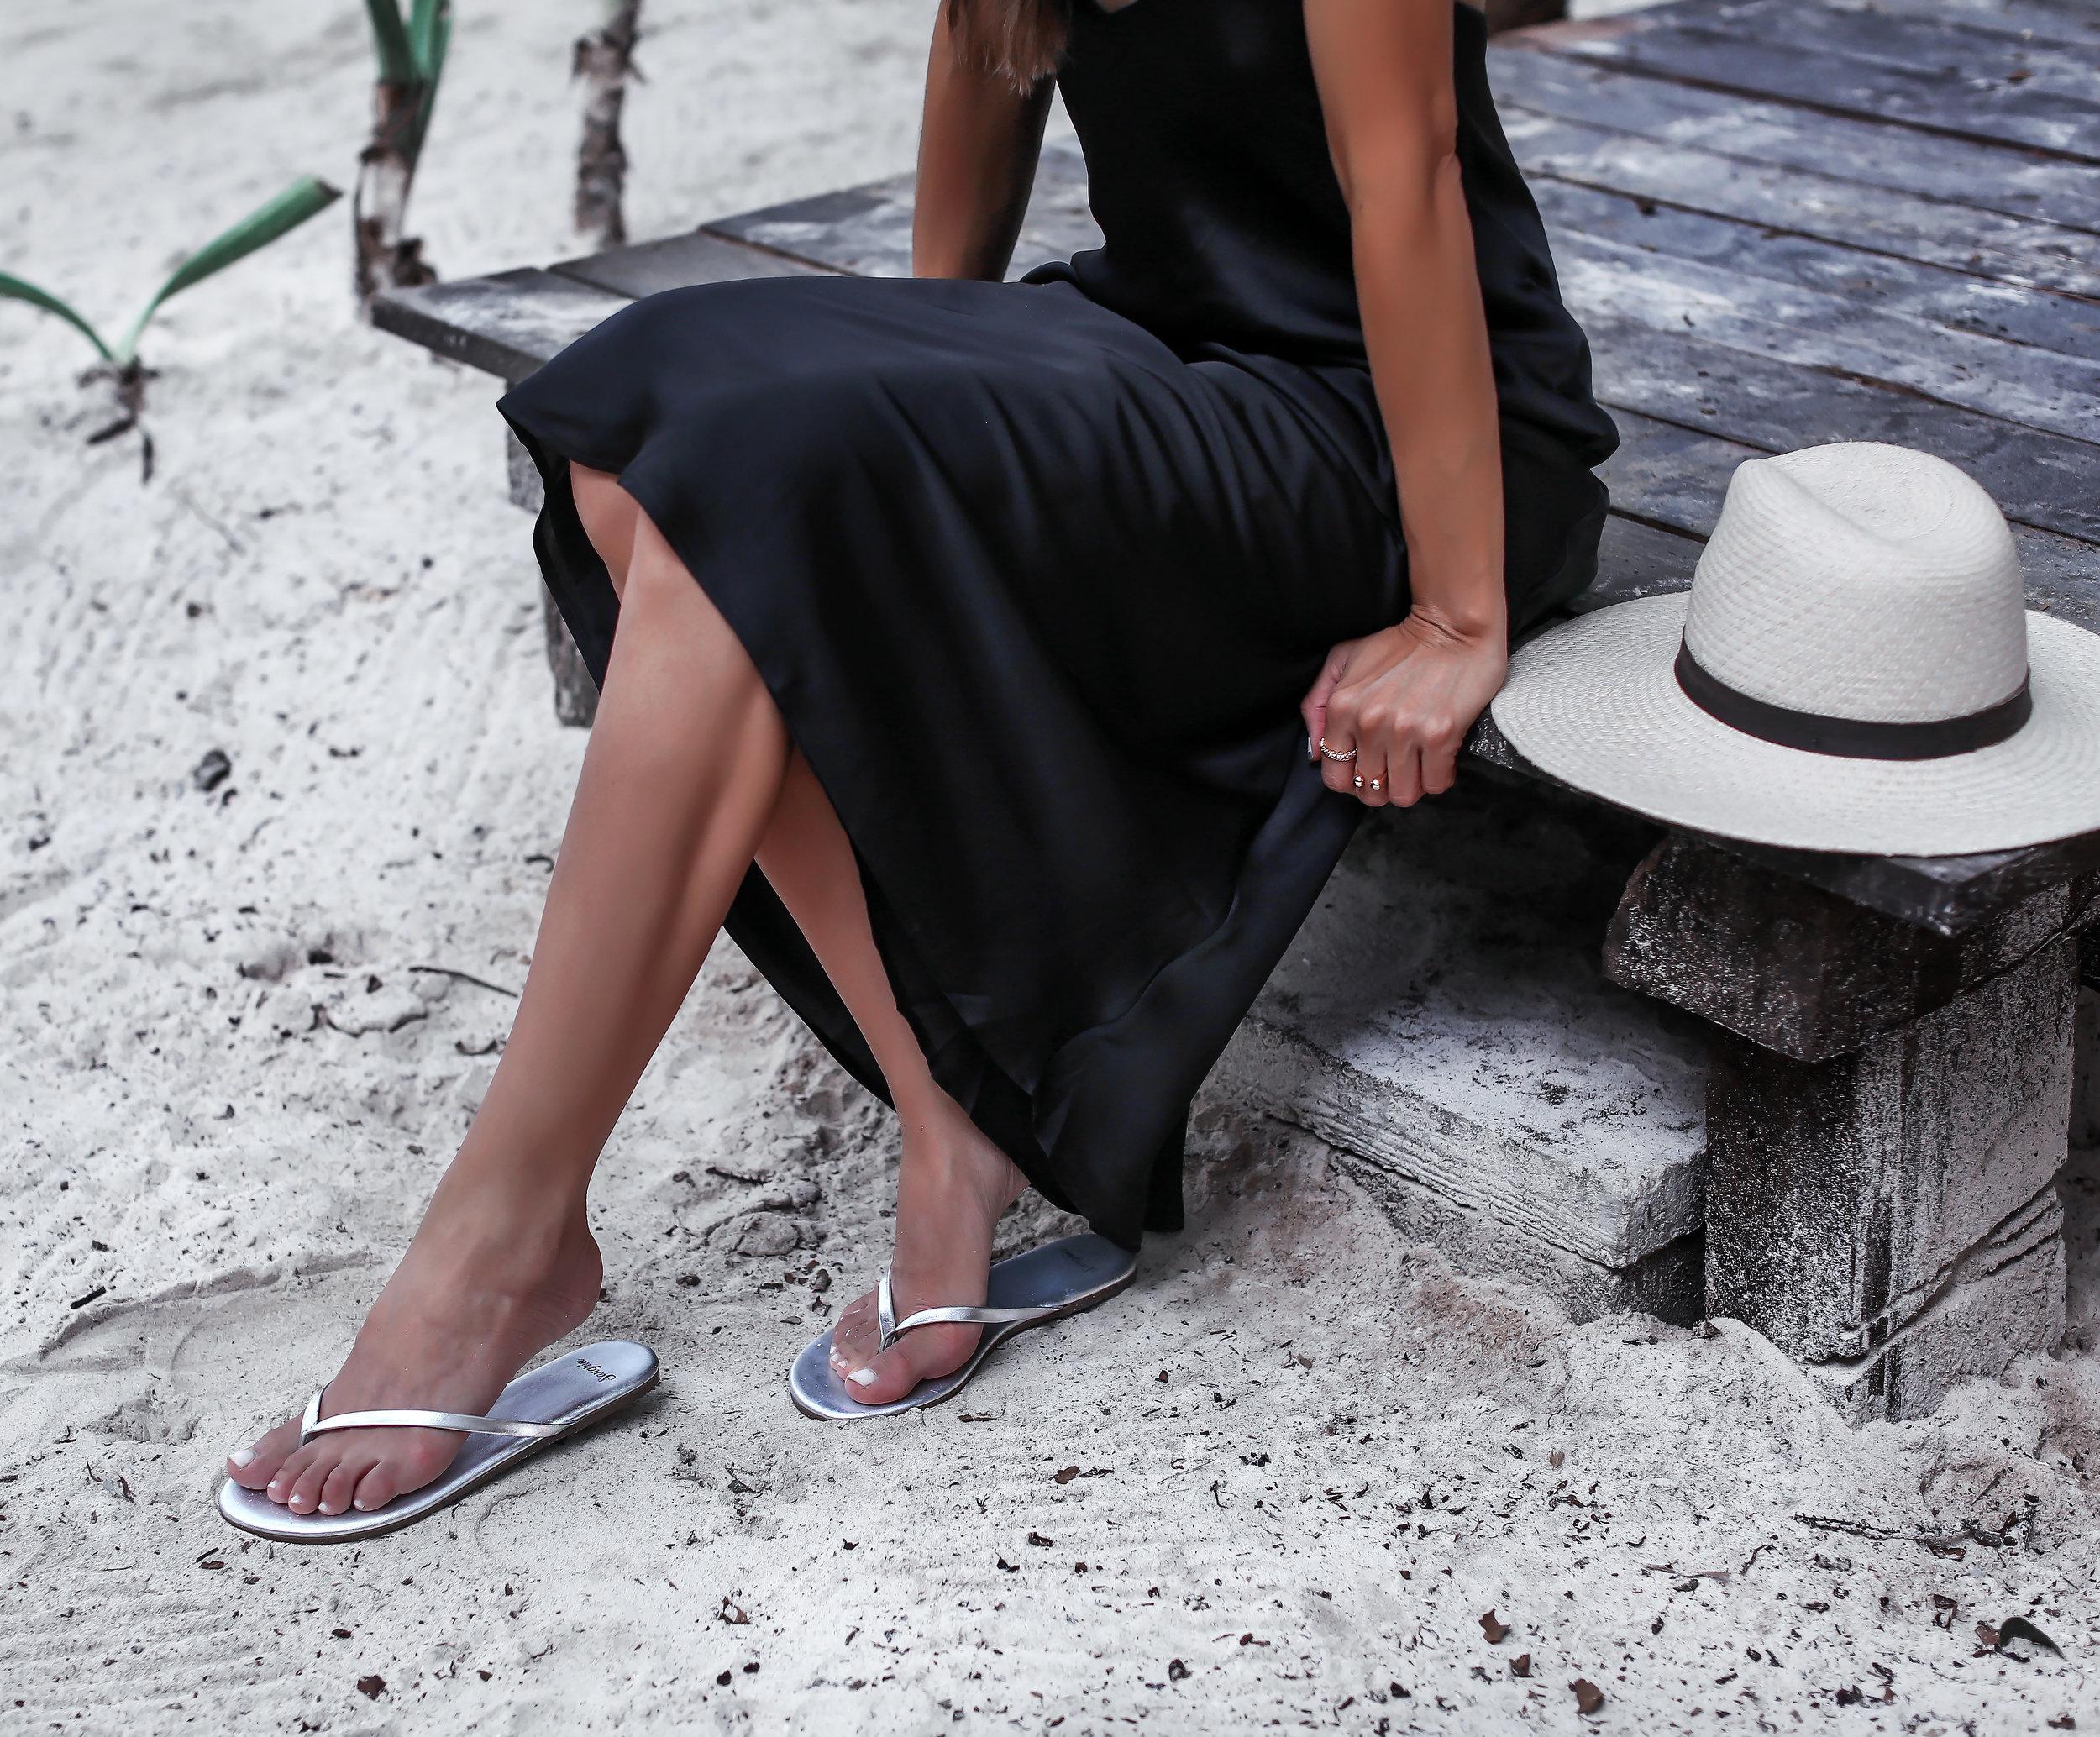 Sangria Sandals Sincerely Jules Slip Dress Janessa Leone Hat Beach Style in Tulum.jpg